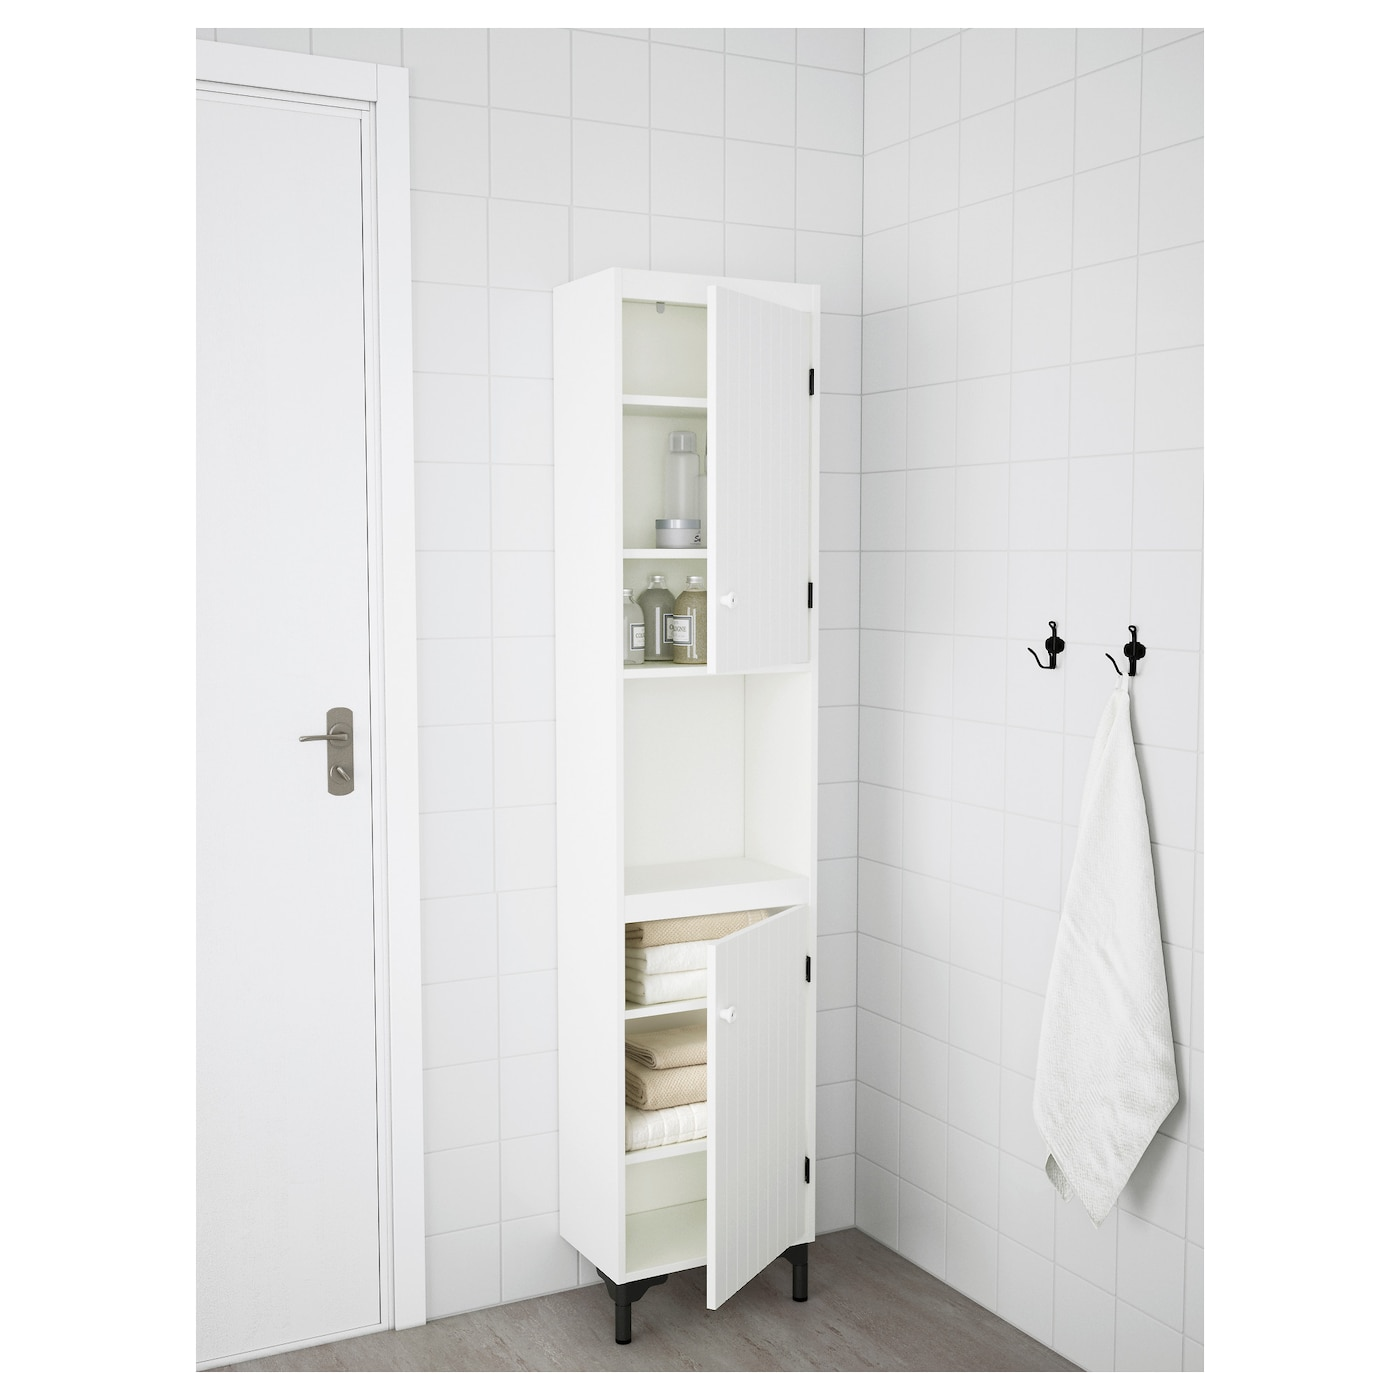 SILVERÅN High cabinet with 2 doors White 40x25x172 cm - IKEA